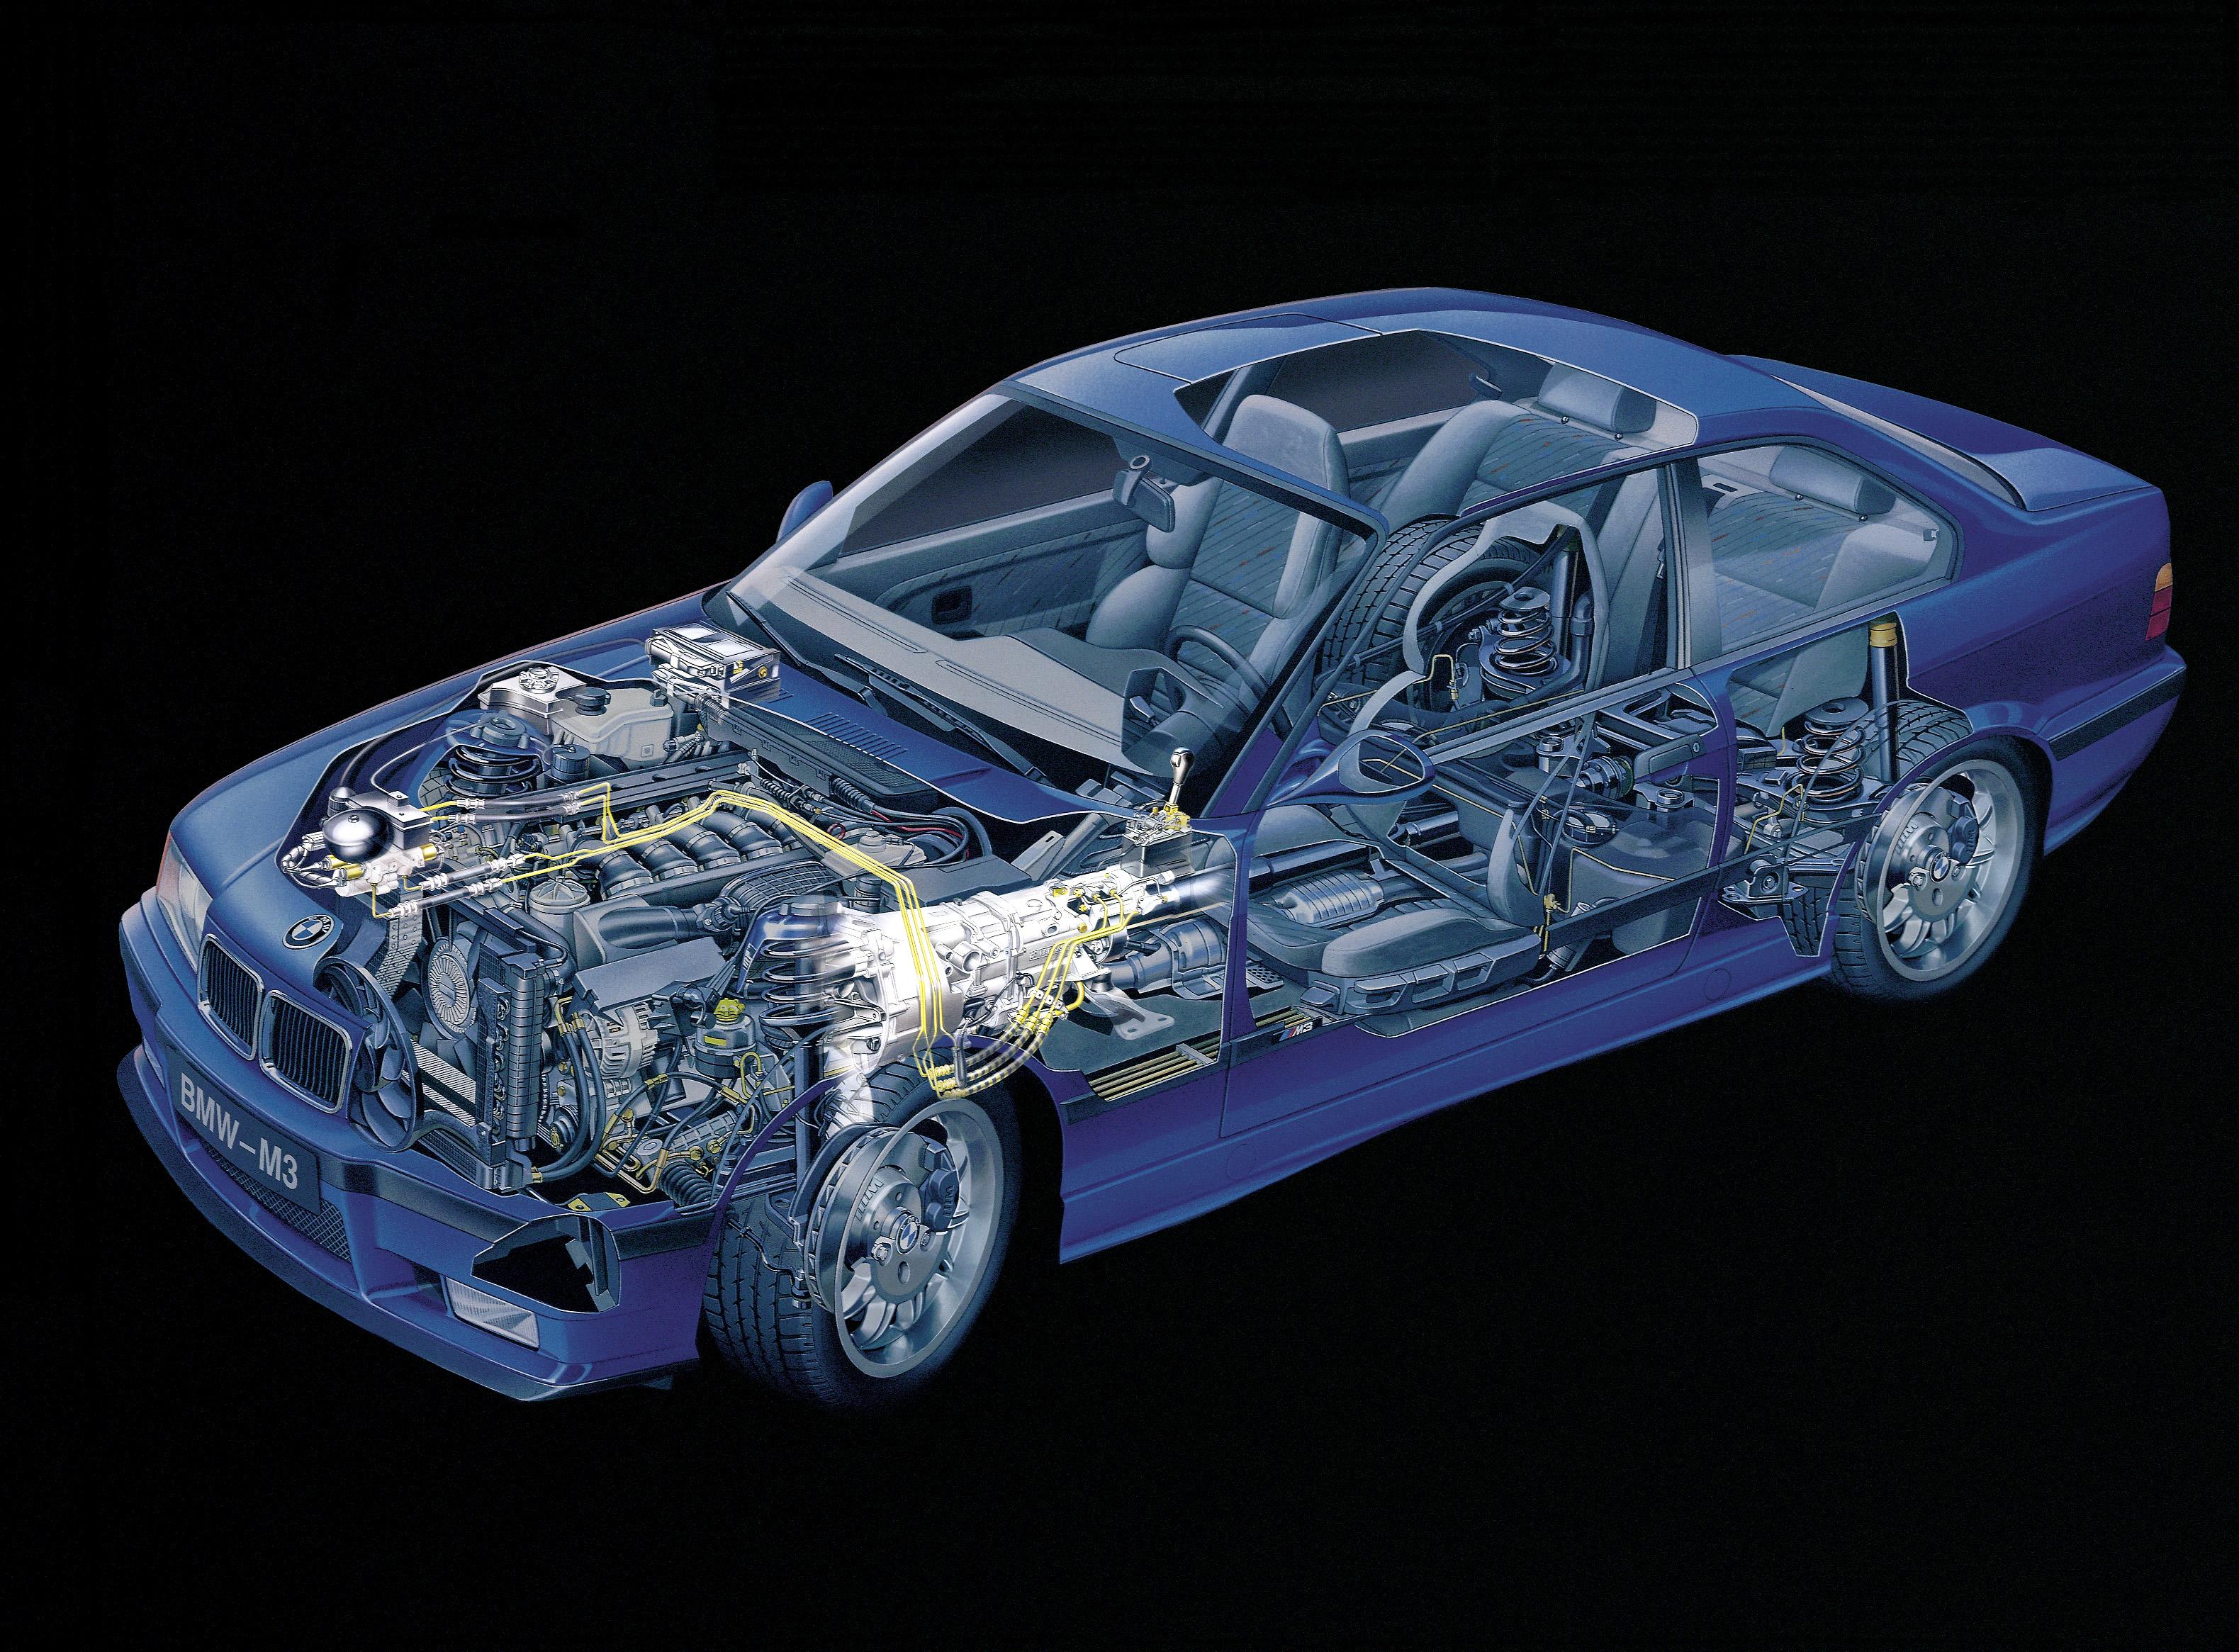 e36 wiring diagram e36 image wiring diagram bmw e36 starter motor wiring diagram jodebal com on e36 wiring diagram